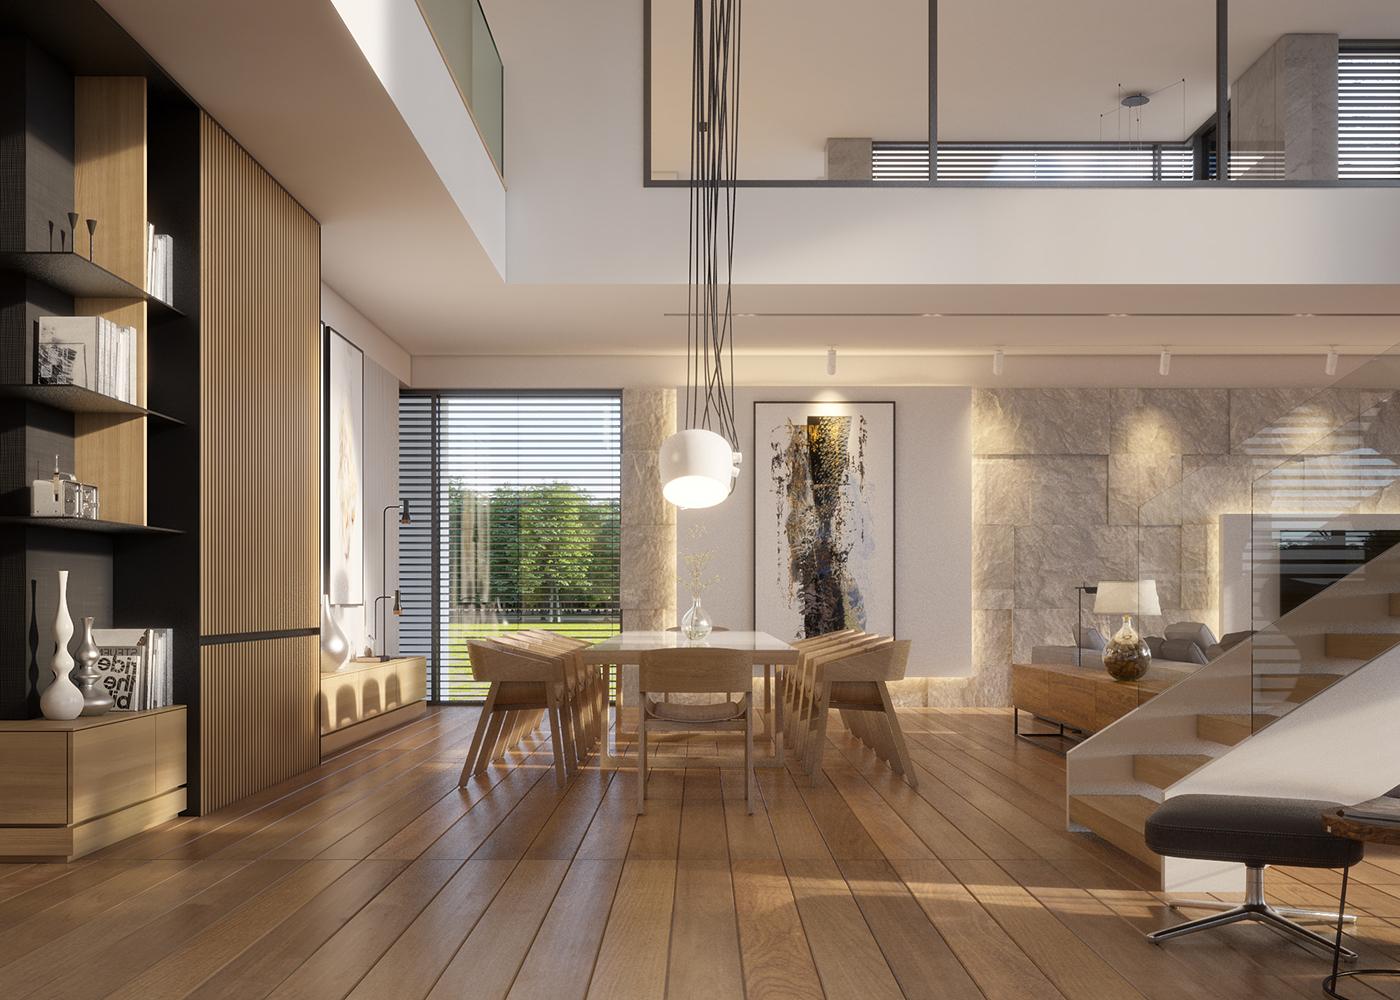 warm  modern interior design  vis  for lk